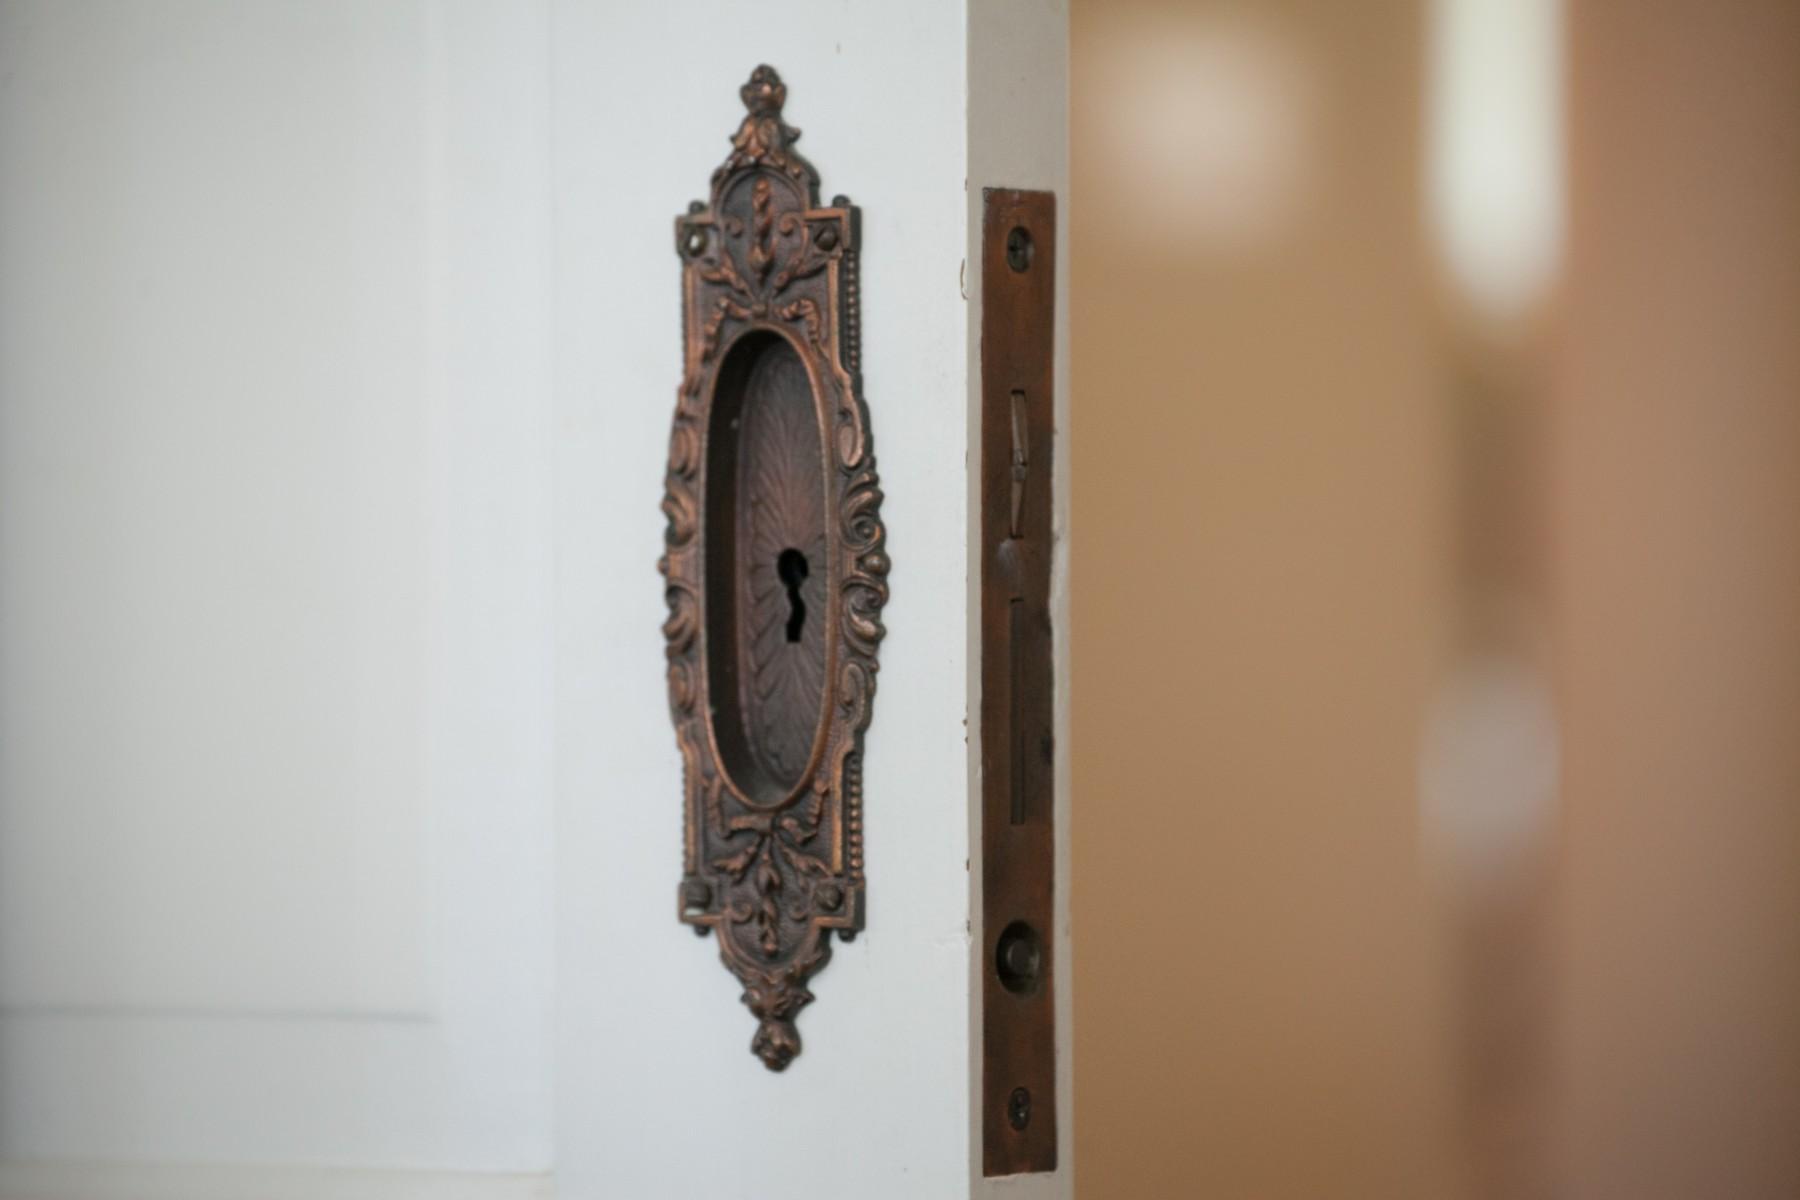 206 NW 8th Street, Corvallis, Oregon-Vintage door hardware